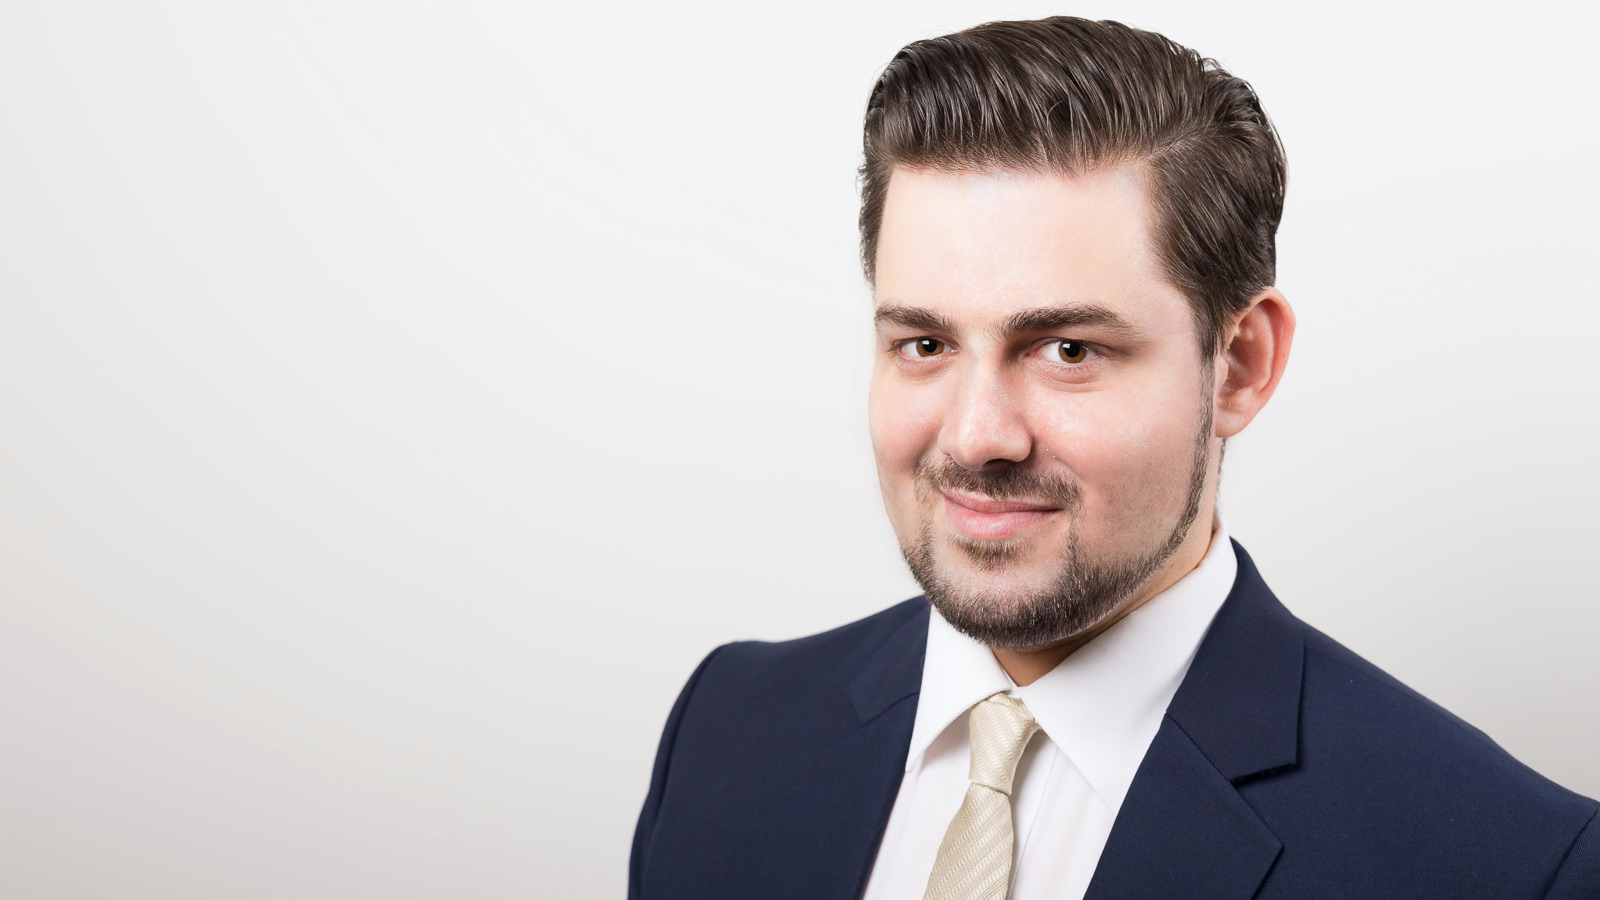 Business Portrait - Bewerbungsfoto